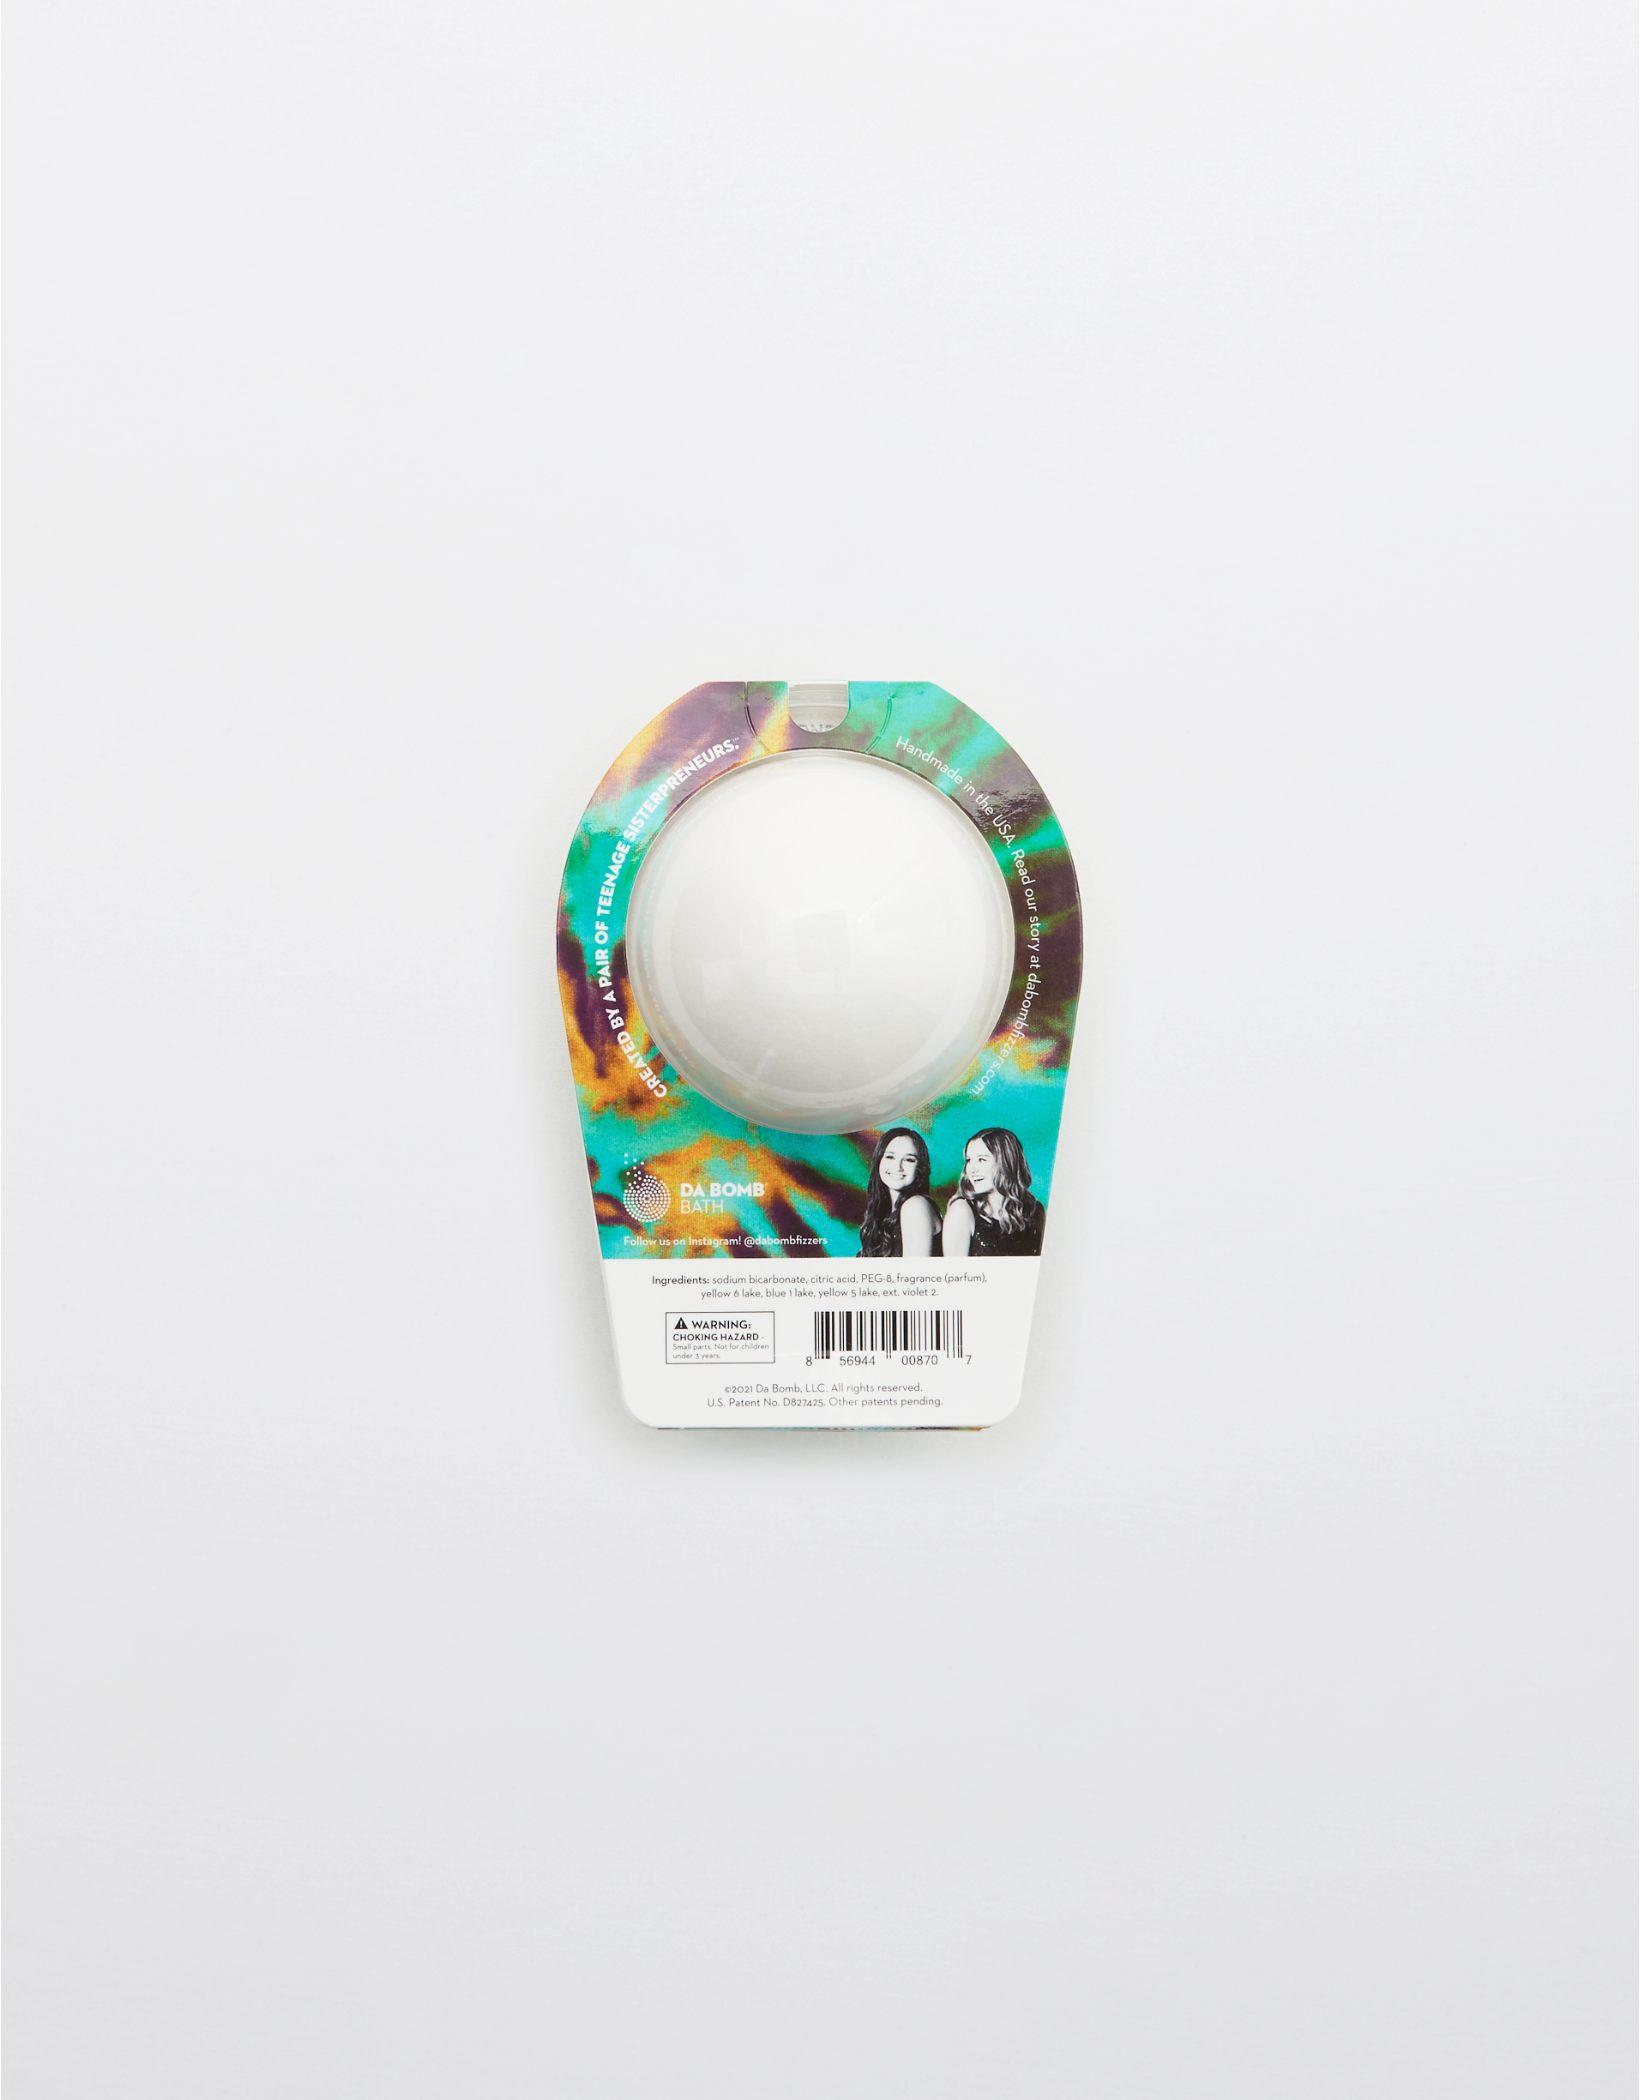 Da Bomb Tie Dye Full Size Bomb - White